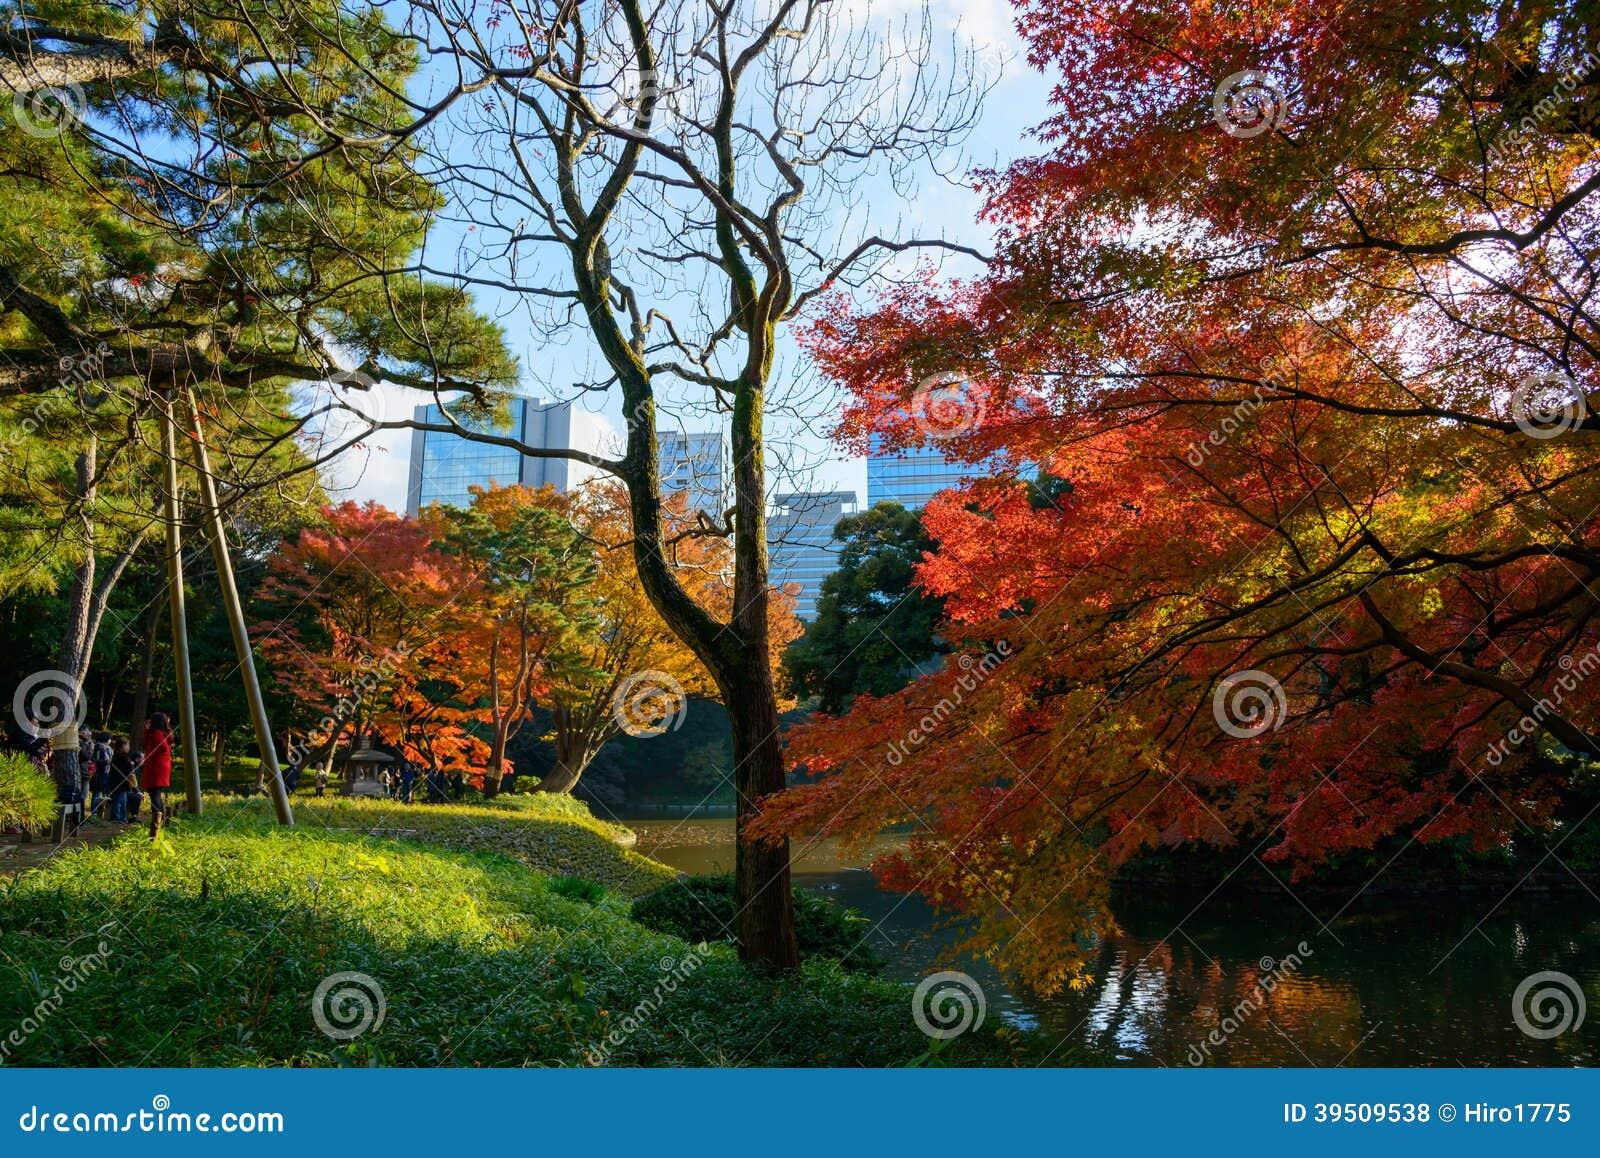 Koishikawa Korakuen Garden in Autumn in Tokyo